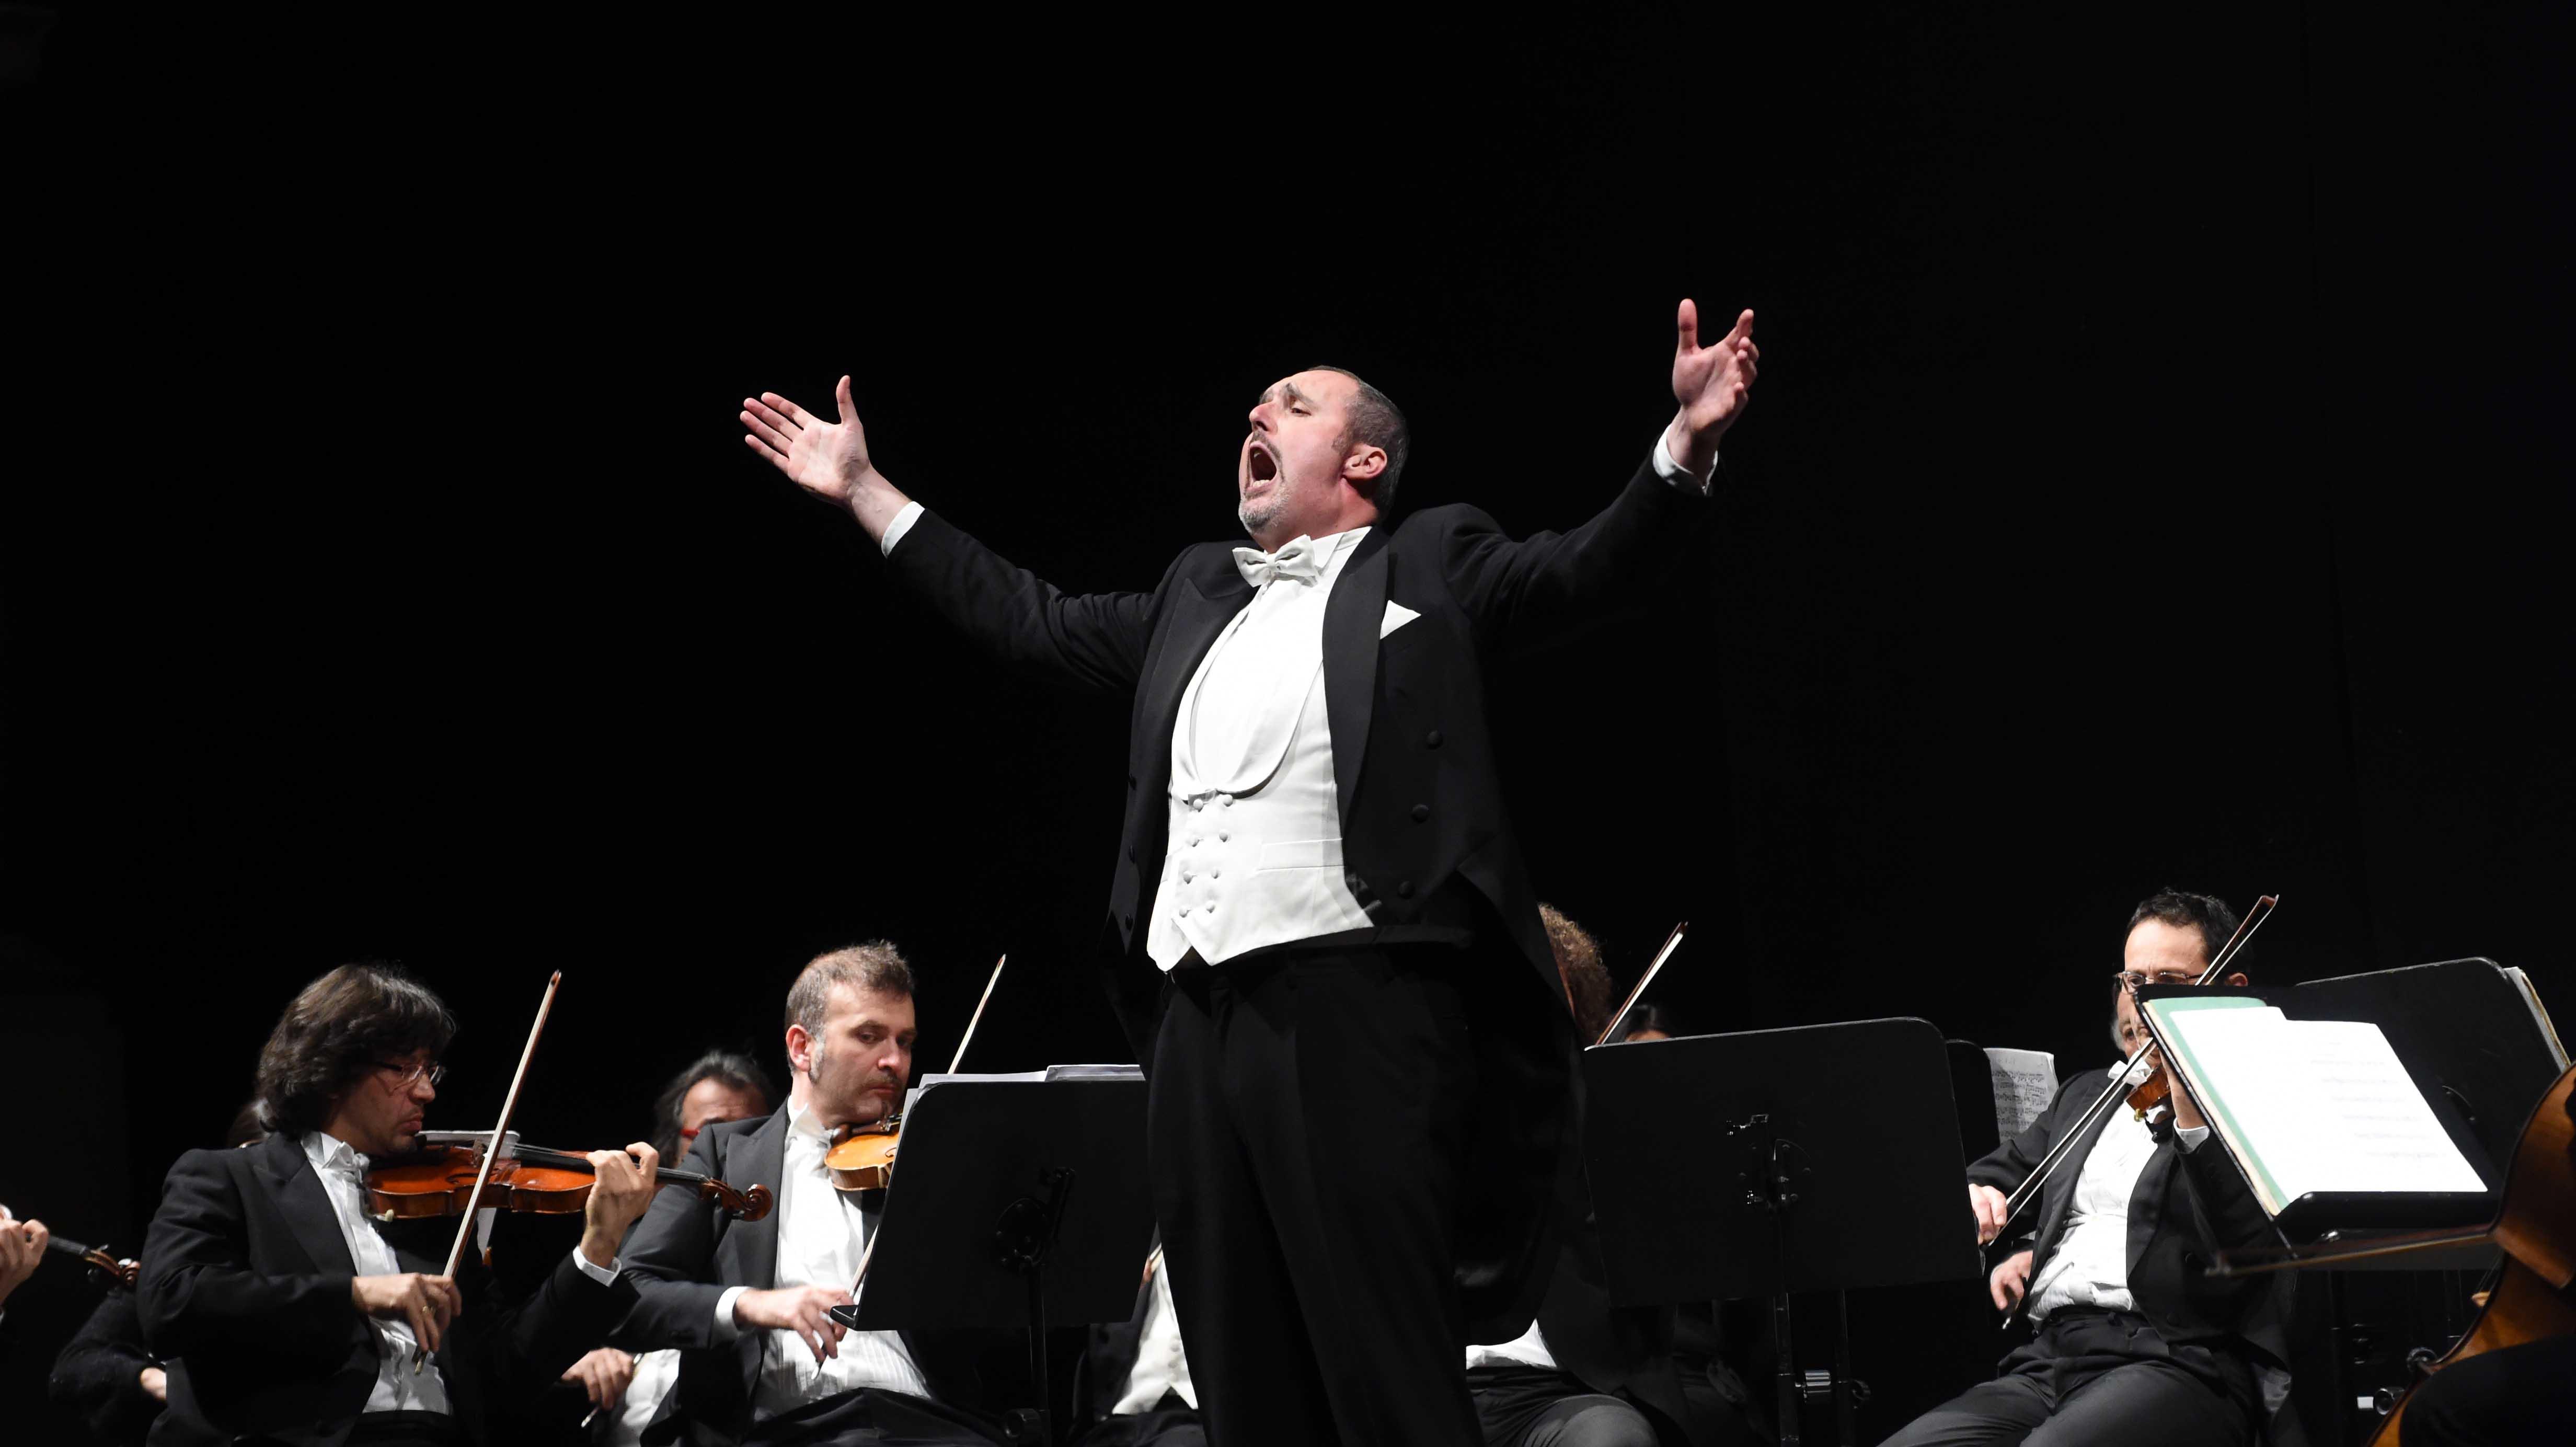 Concerti-classici